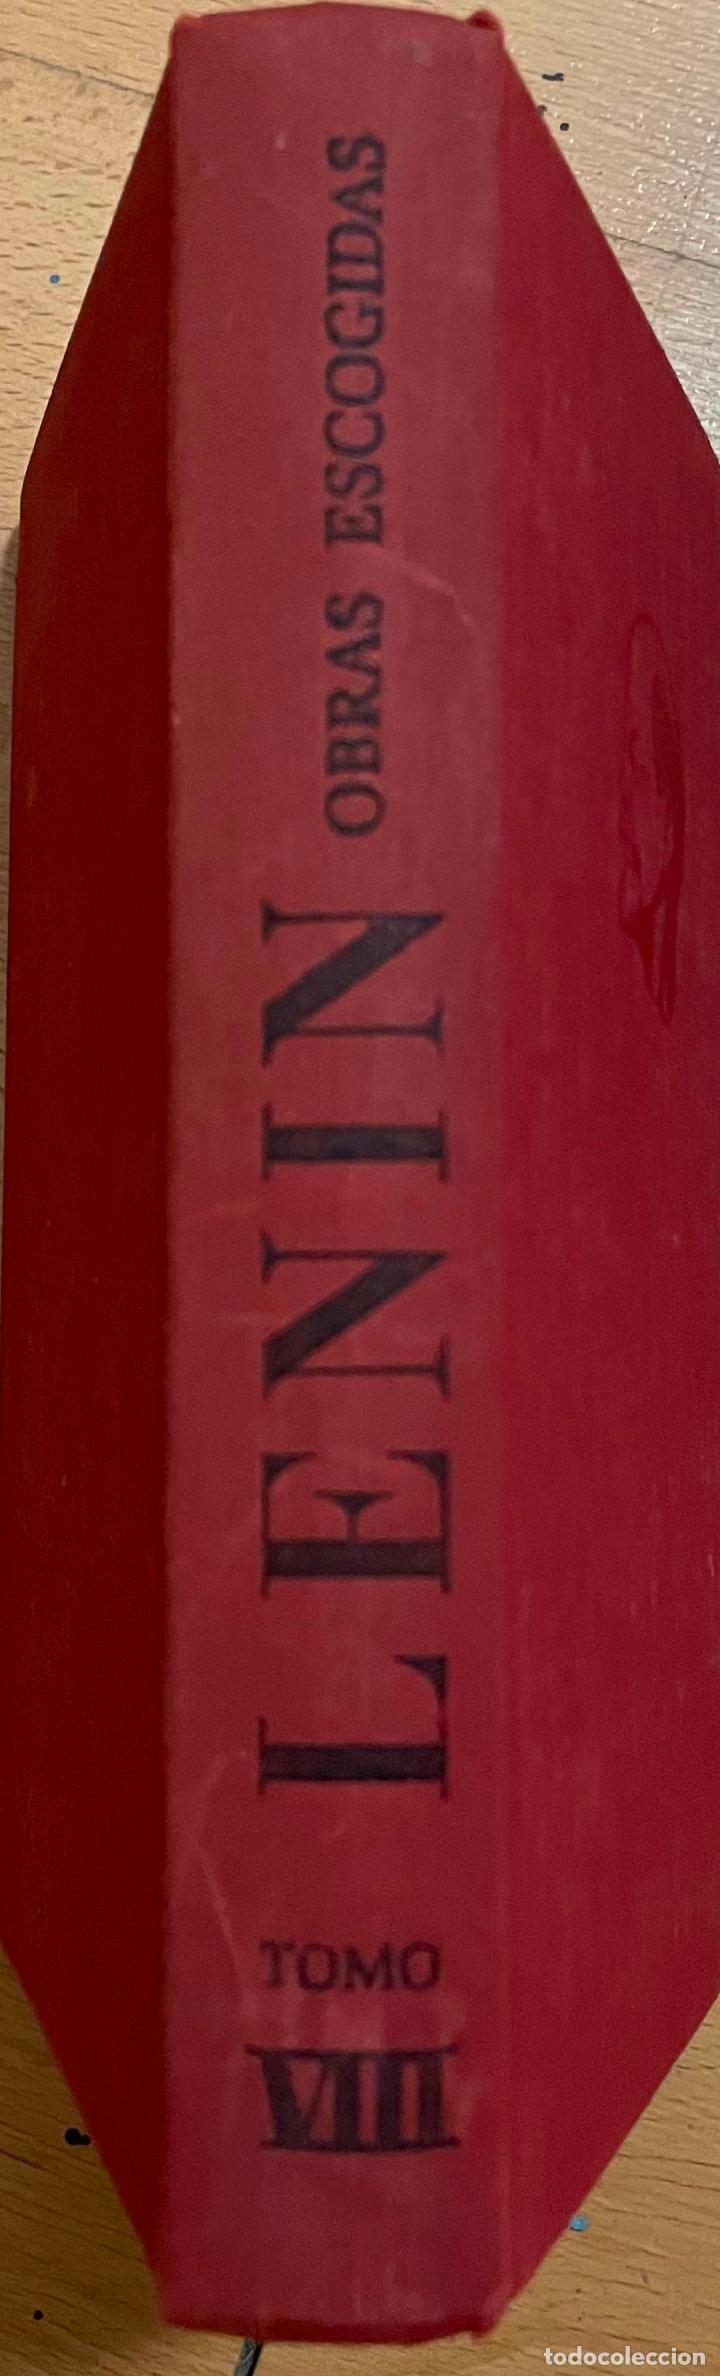 OBRAS ESCOGIDAS LENIN, TOMO 8, EDITORIAL PROGRESO, 1975 (Libros de Segunda Mano (posteriores a 1936) - Literatura - Teatro)